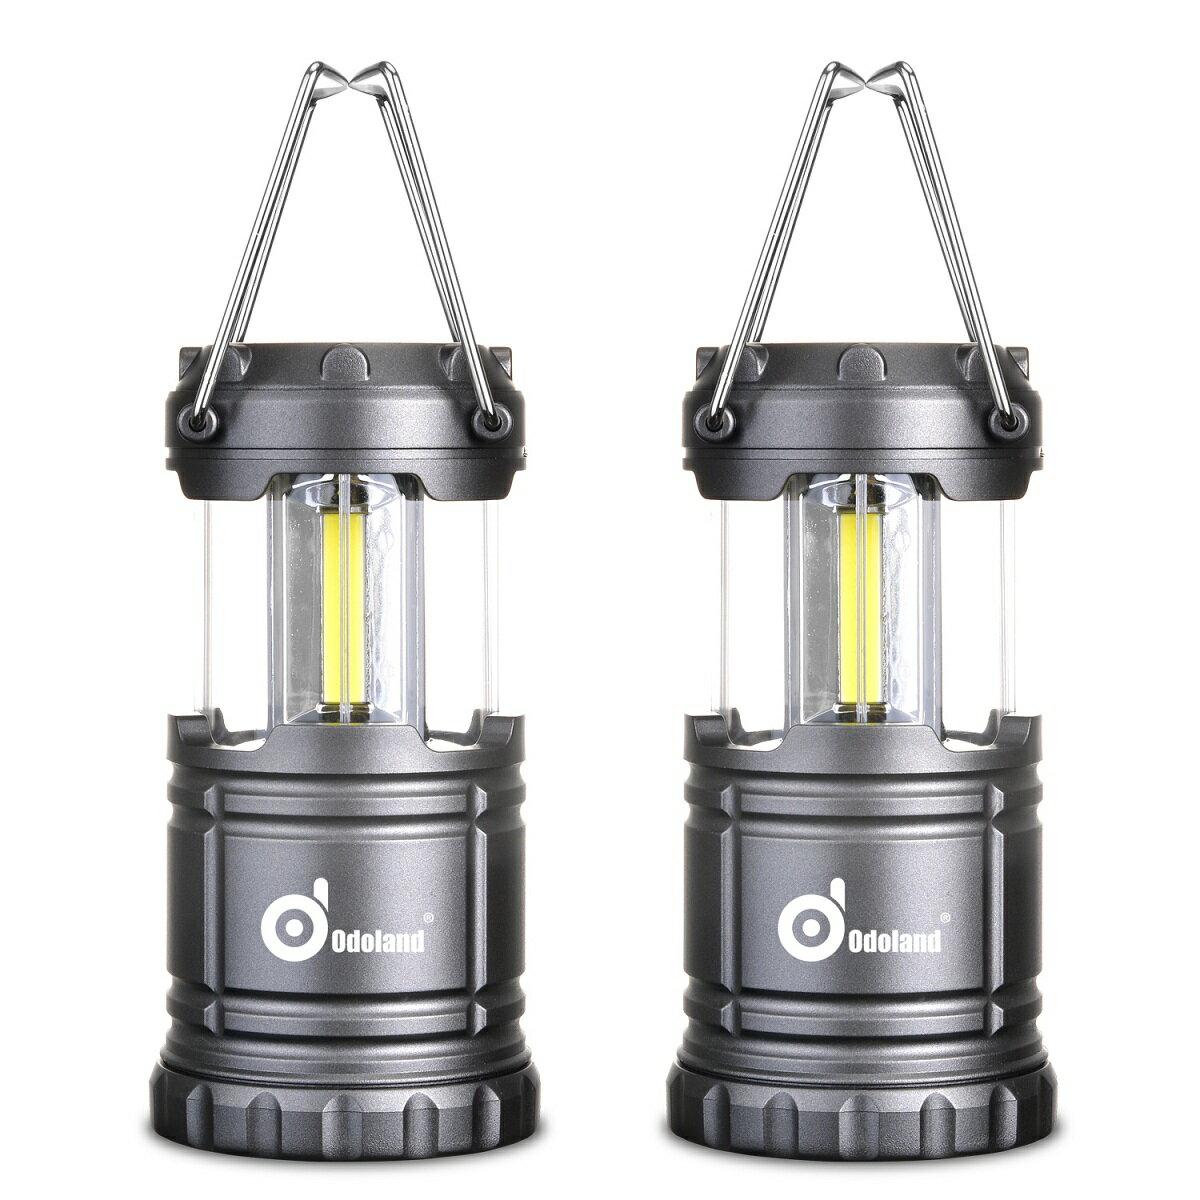 Odoland LEDキャンプランタン 最新のCOB LED採用 120ルーメン 電池式 携帯型 折りたたみ式 防水 キャンプ ハイキング 魚釣り 登山 エクスプローラー アウトドア 室内 停電 豪雨 防災緊急対策など適用